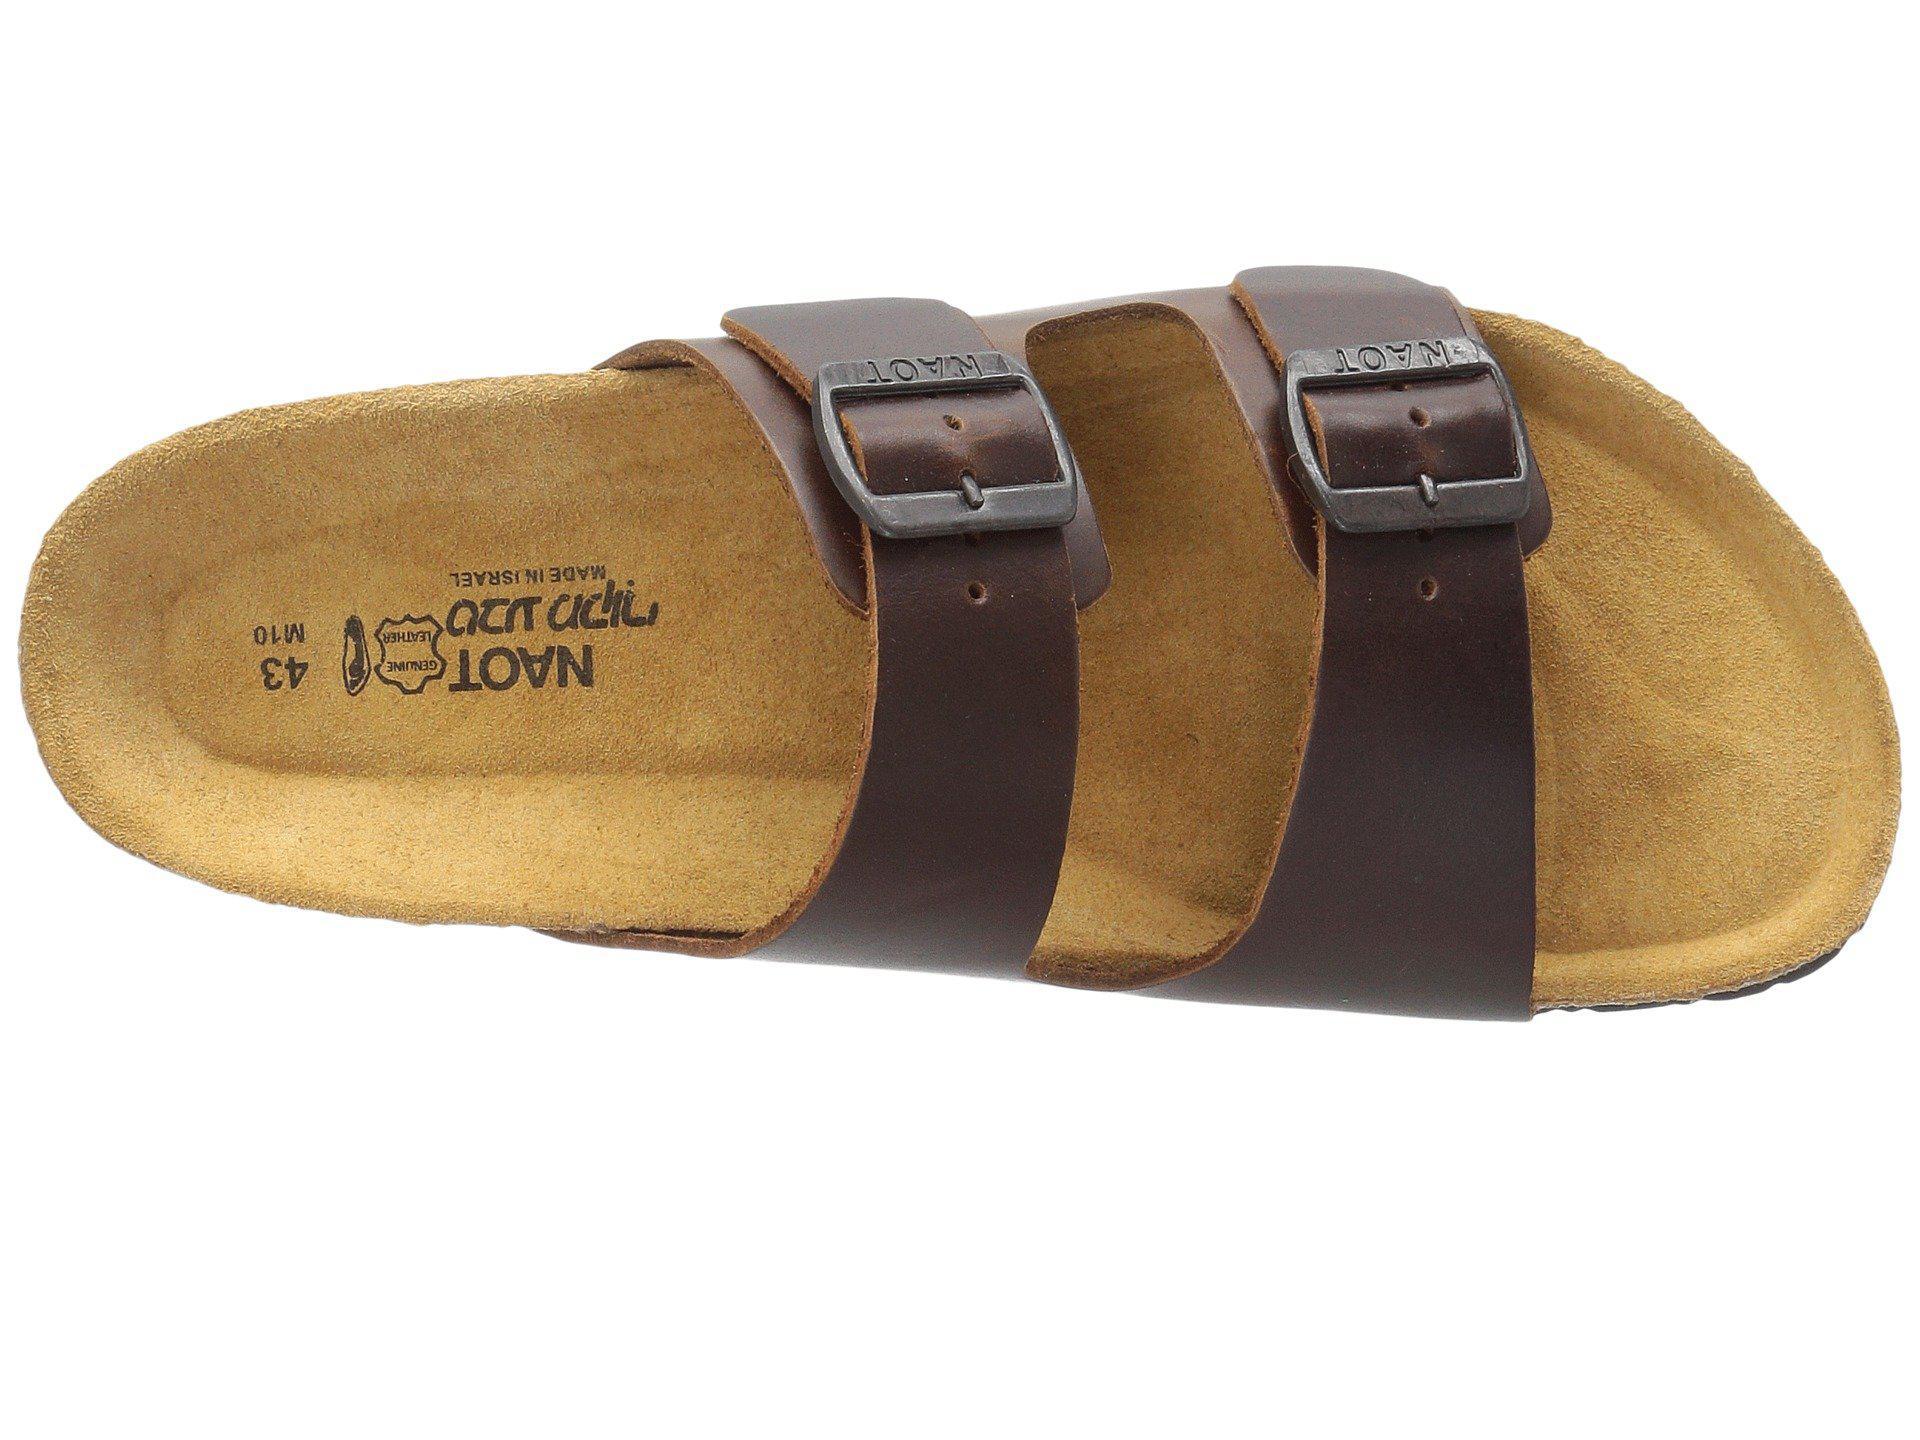 95a2f3b5b5e4 Lyst - Naot Santa Barbara (buffalo Leather) Men s Sandals in Brown ...